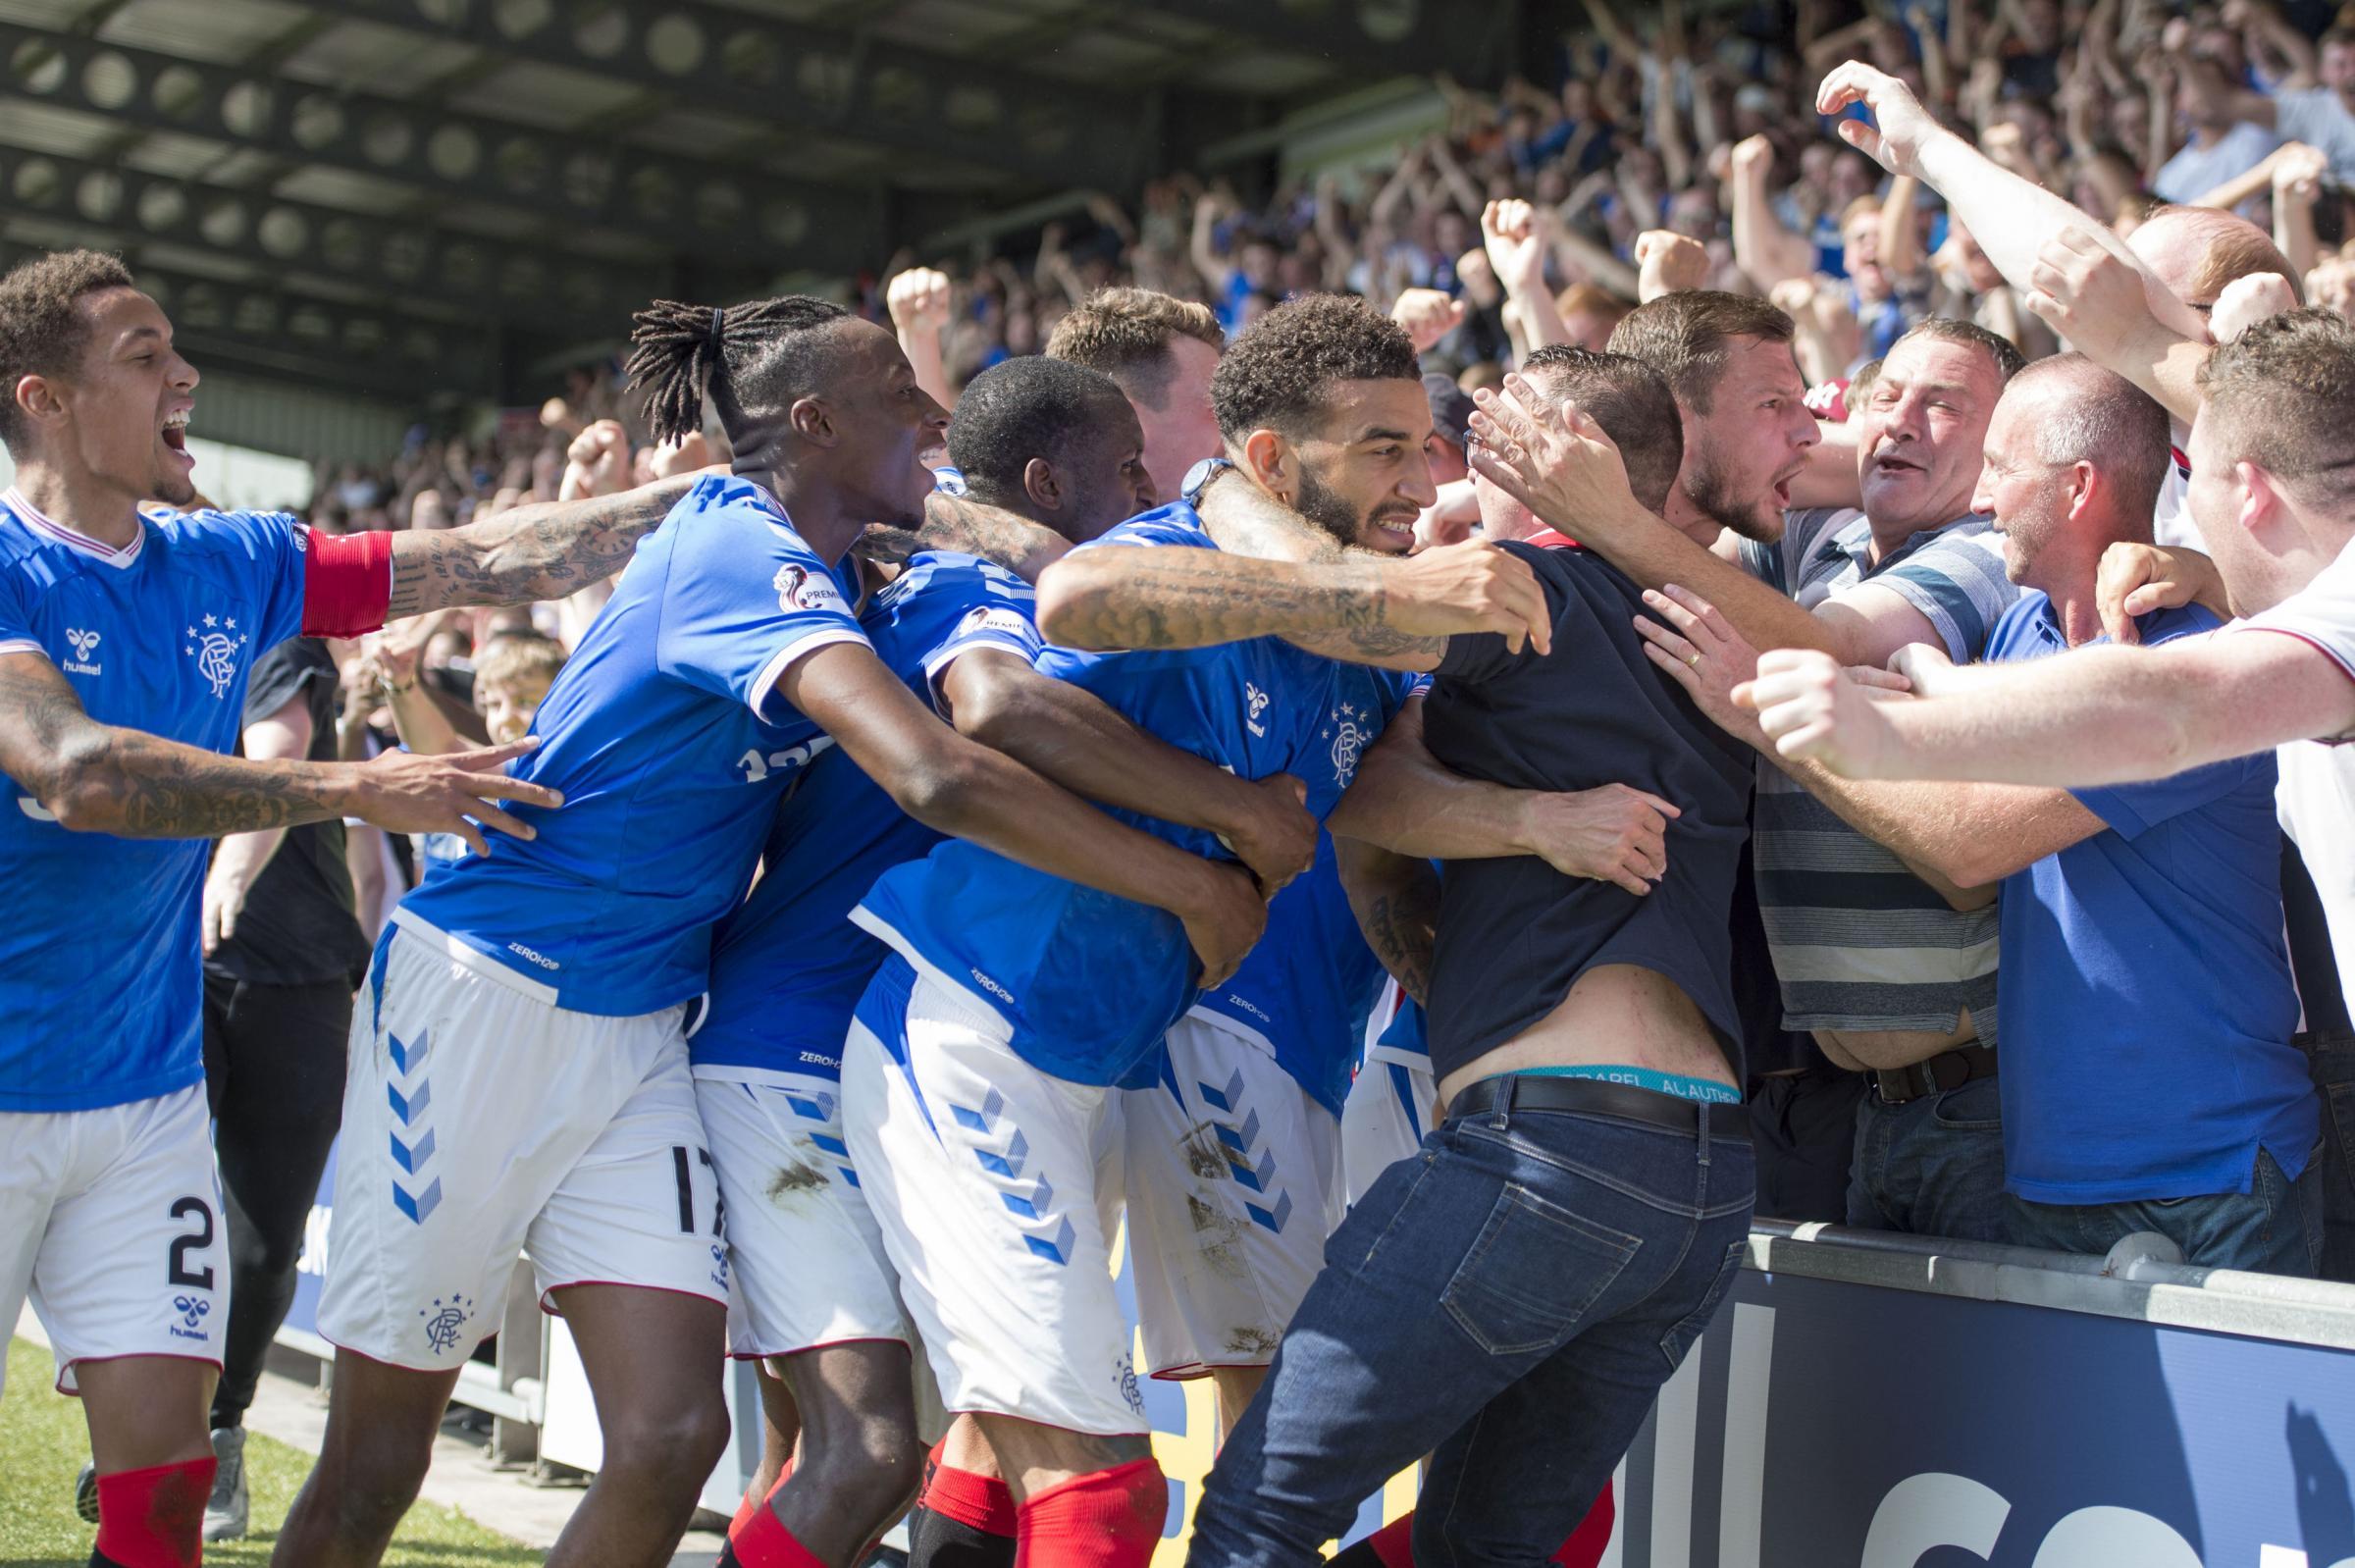 St Mirren 0-1 Rangers: Five talking points as Steven Gerrard's side maintain their momentum with narrow win